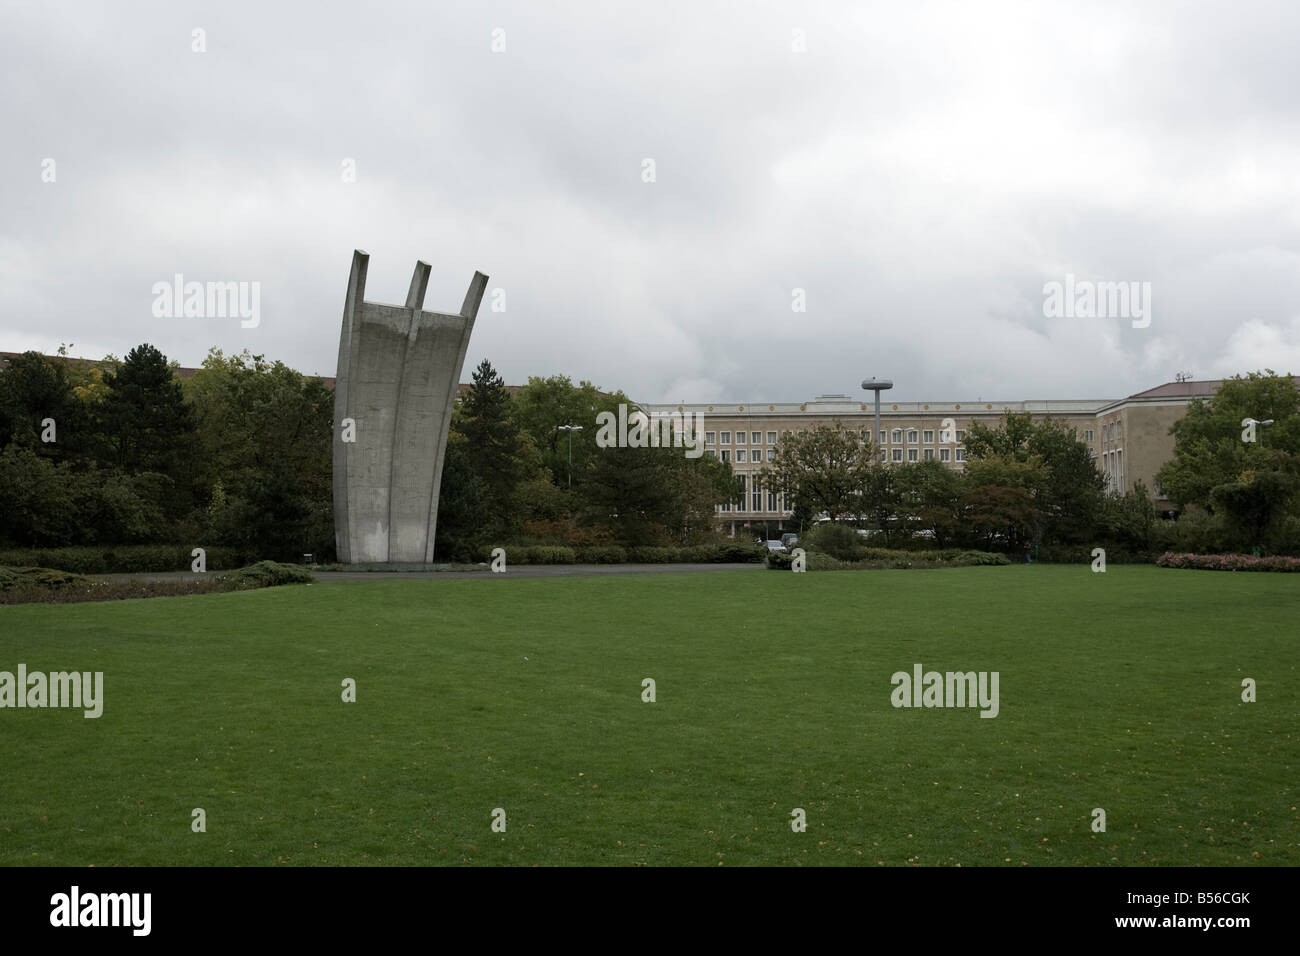 The Berlin Airlift Memorial at Tempelhof Flughafen, Berlin, Germany - Stock Image